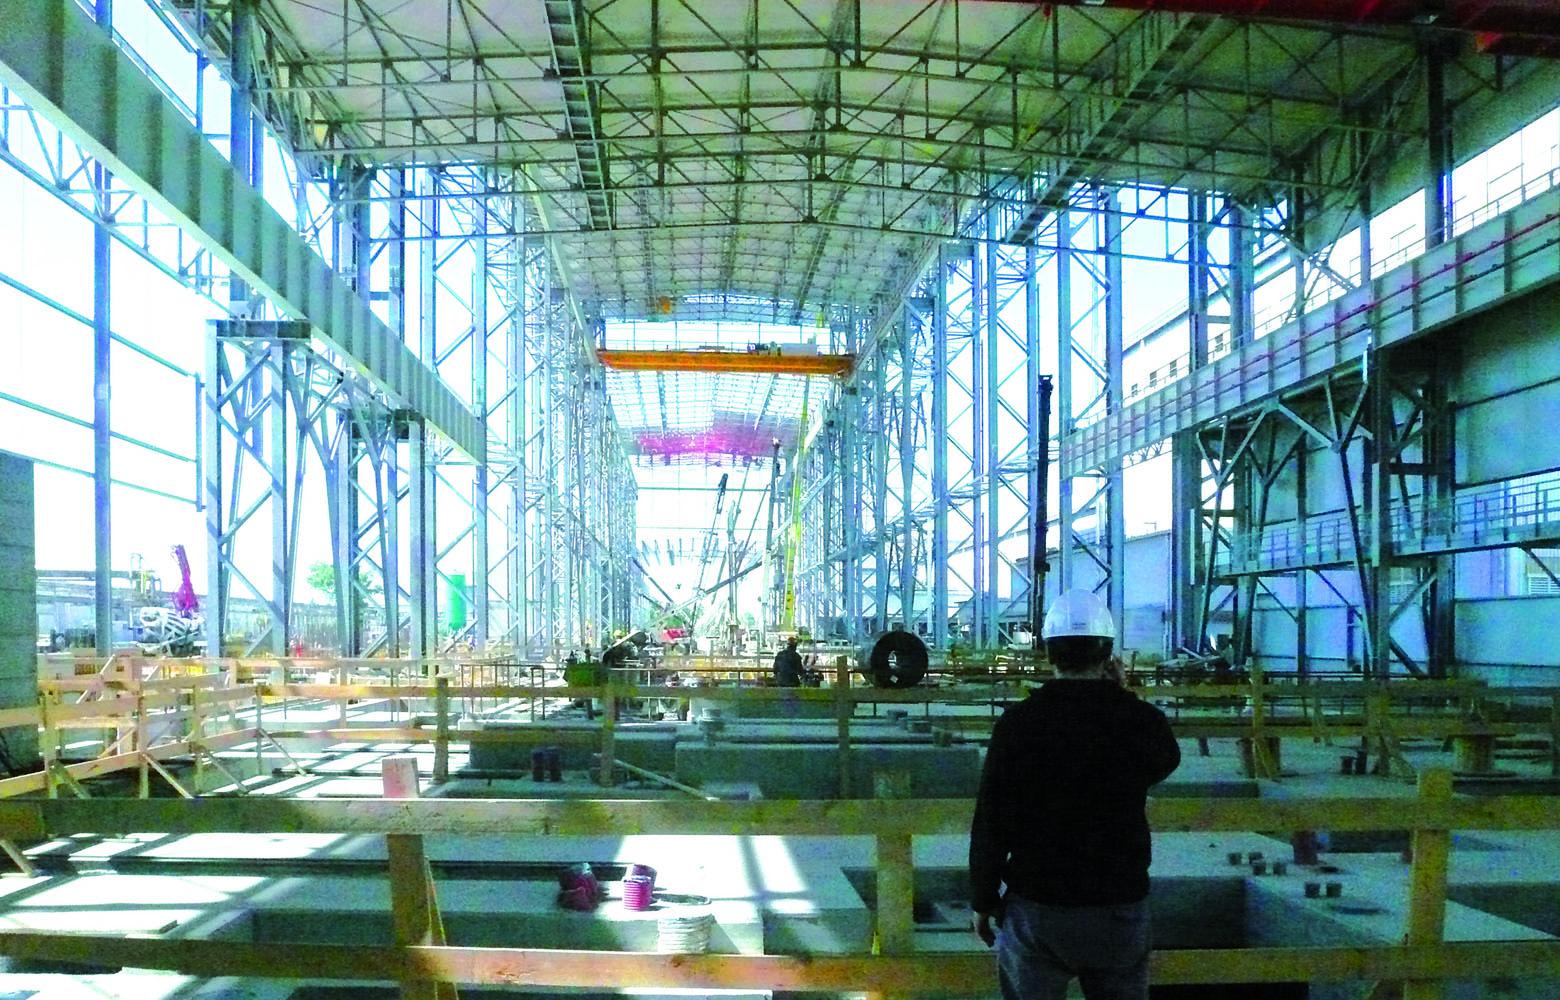 08 - 15 marzo 2009